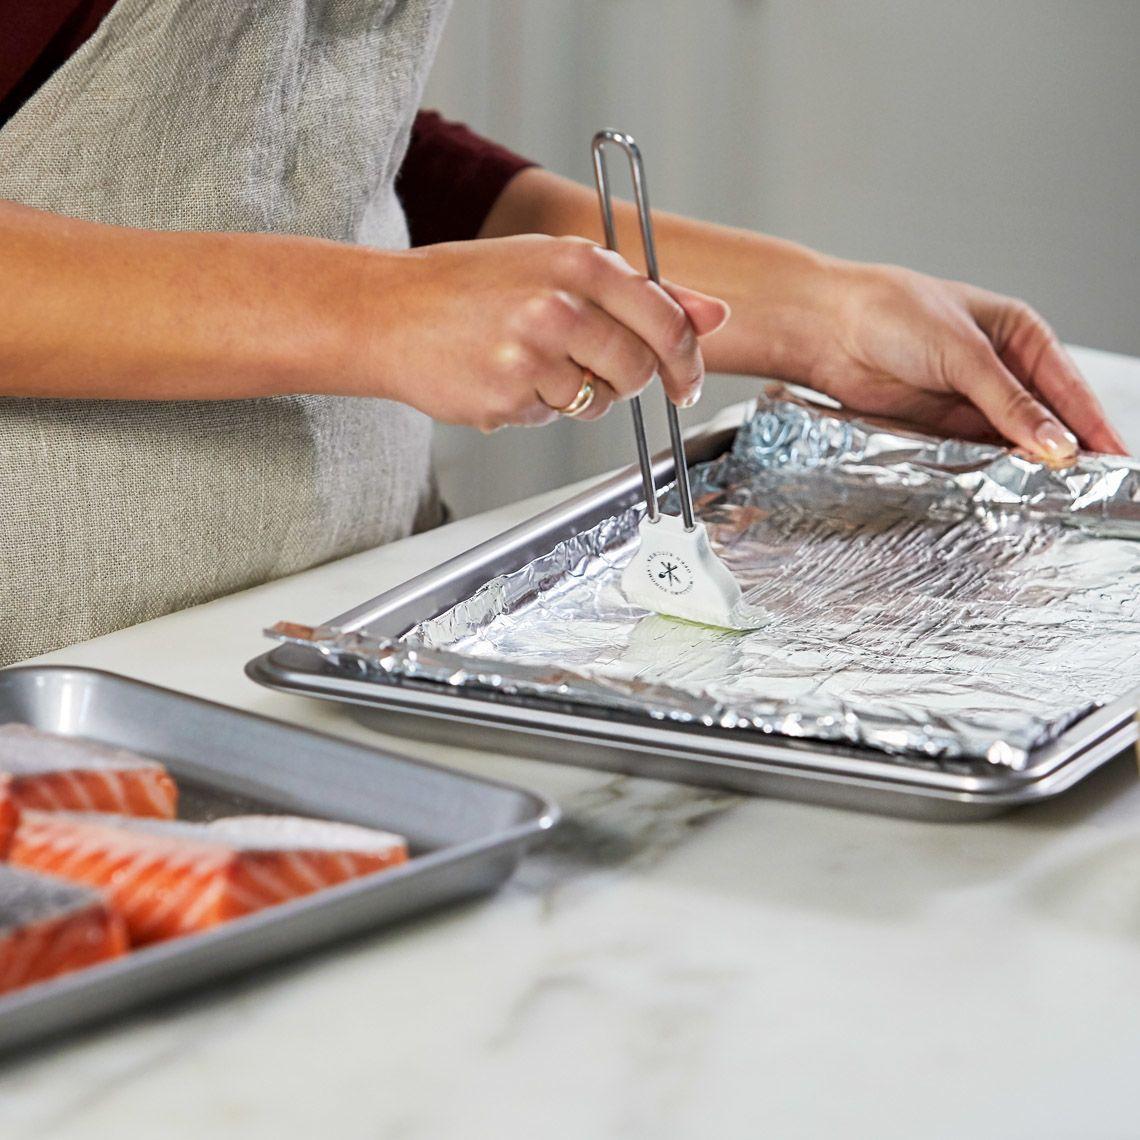 Prepare baking sheet